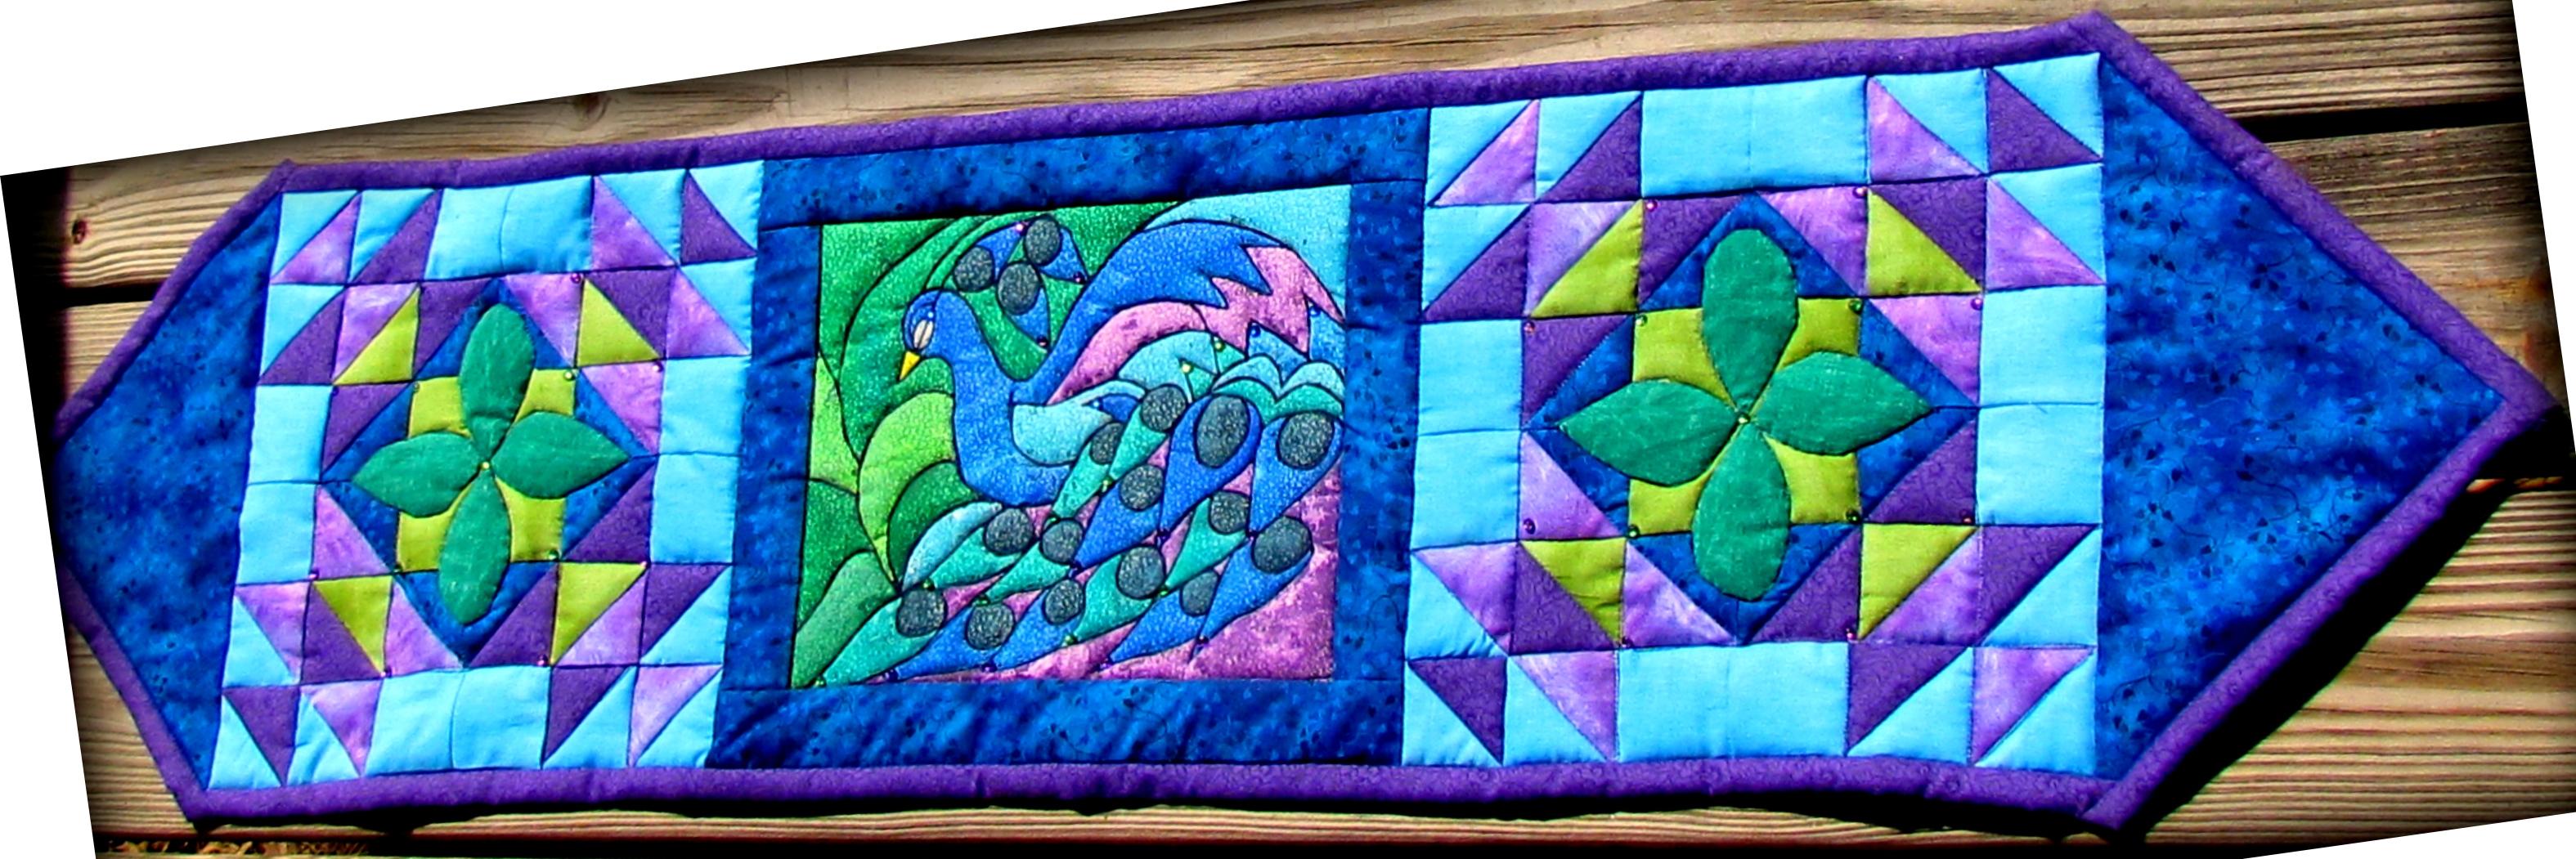 Suzy S Majestic Peacock Ebook Pattern